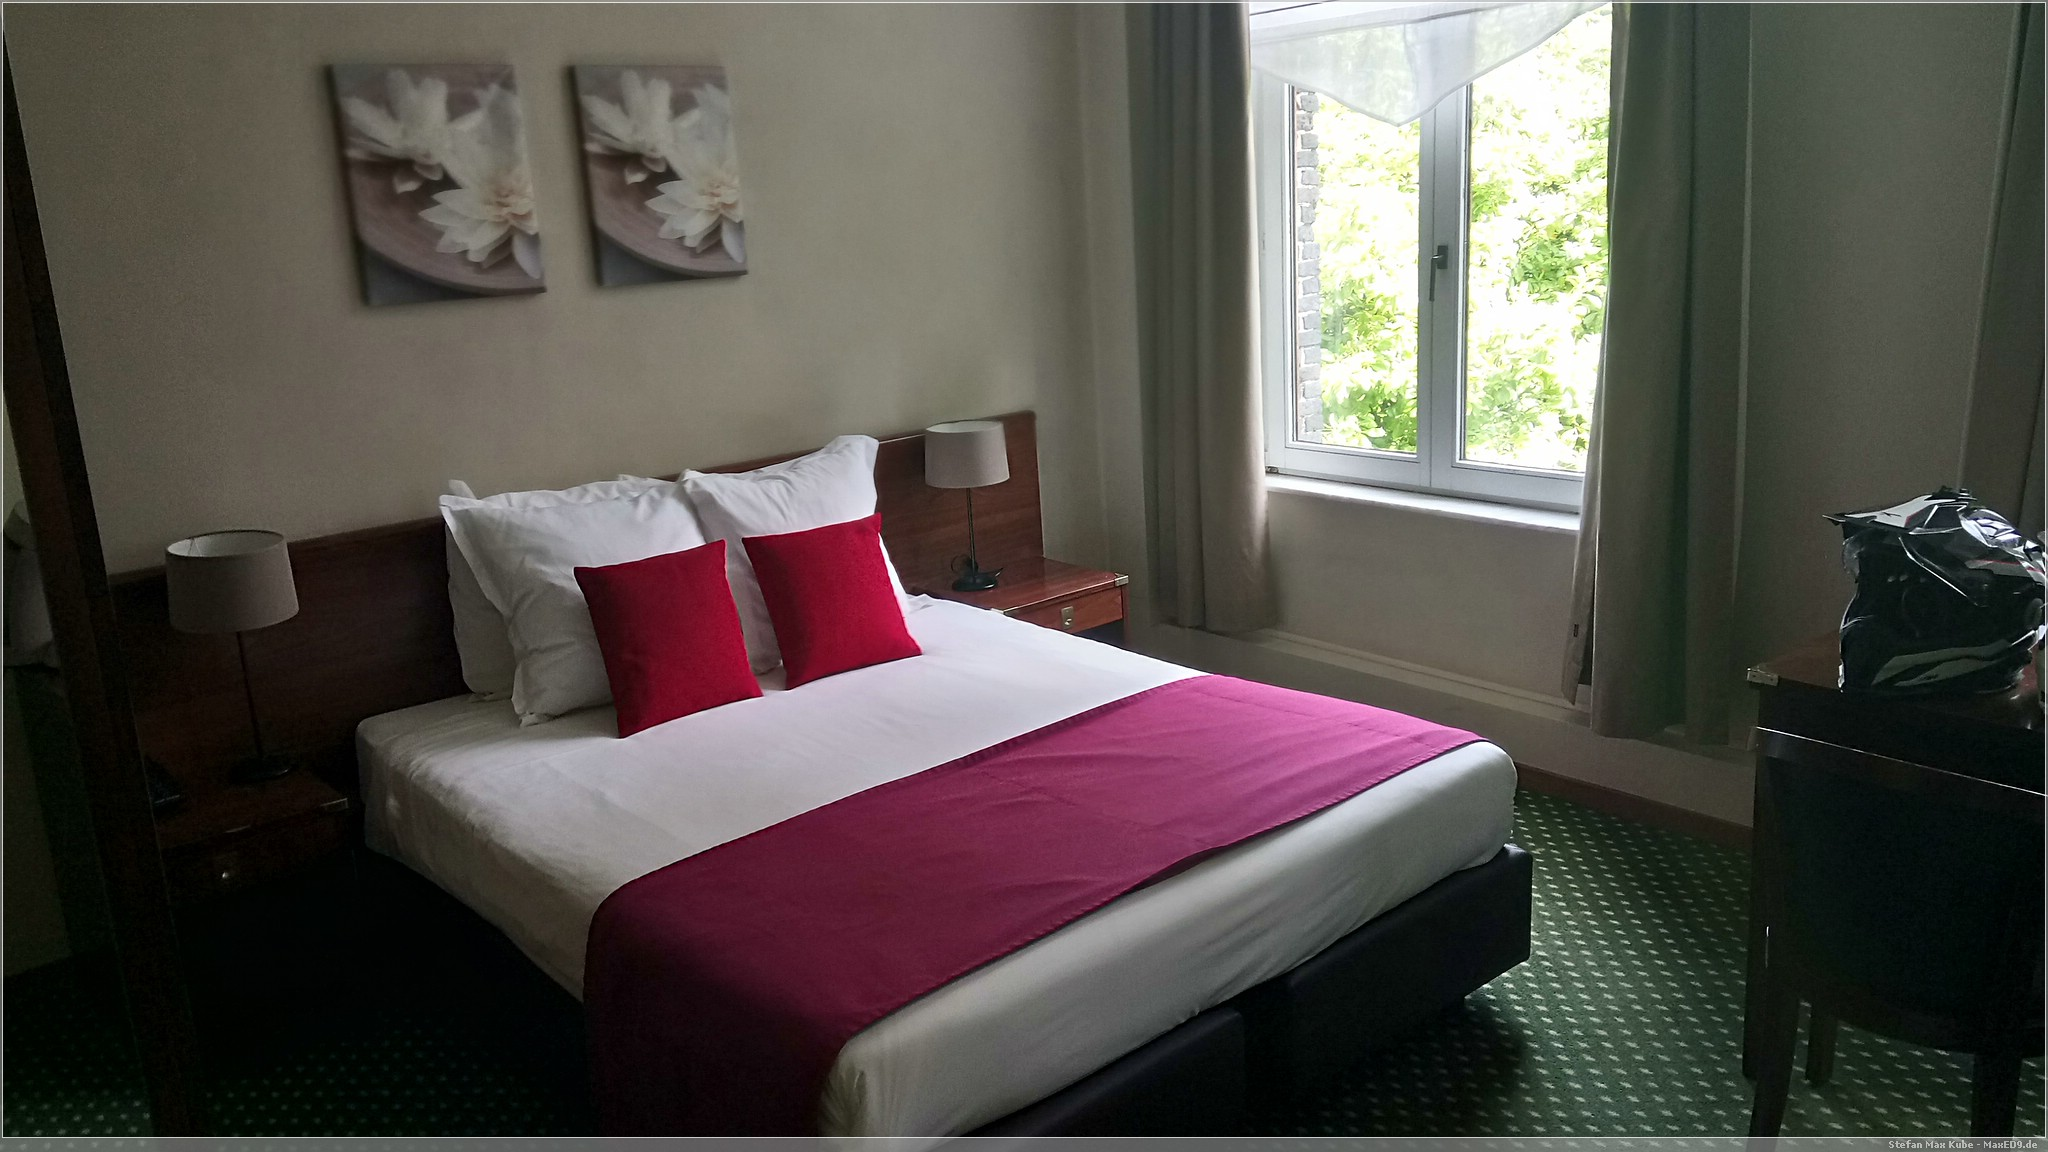 das Zimmer in Mons, Belgien